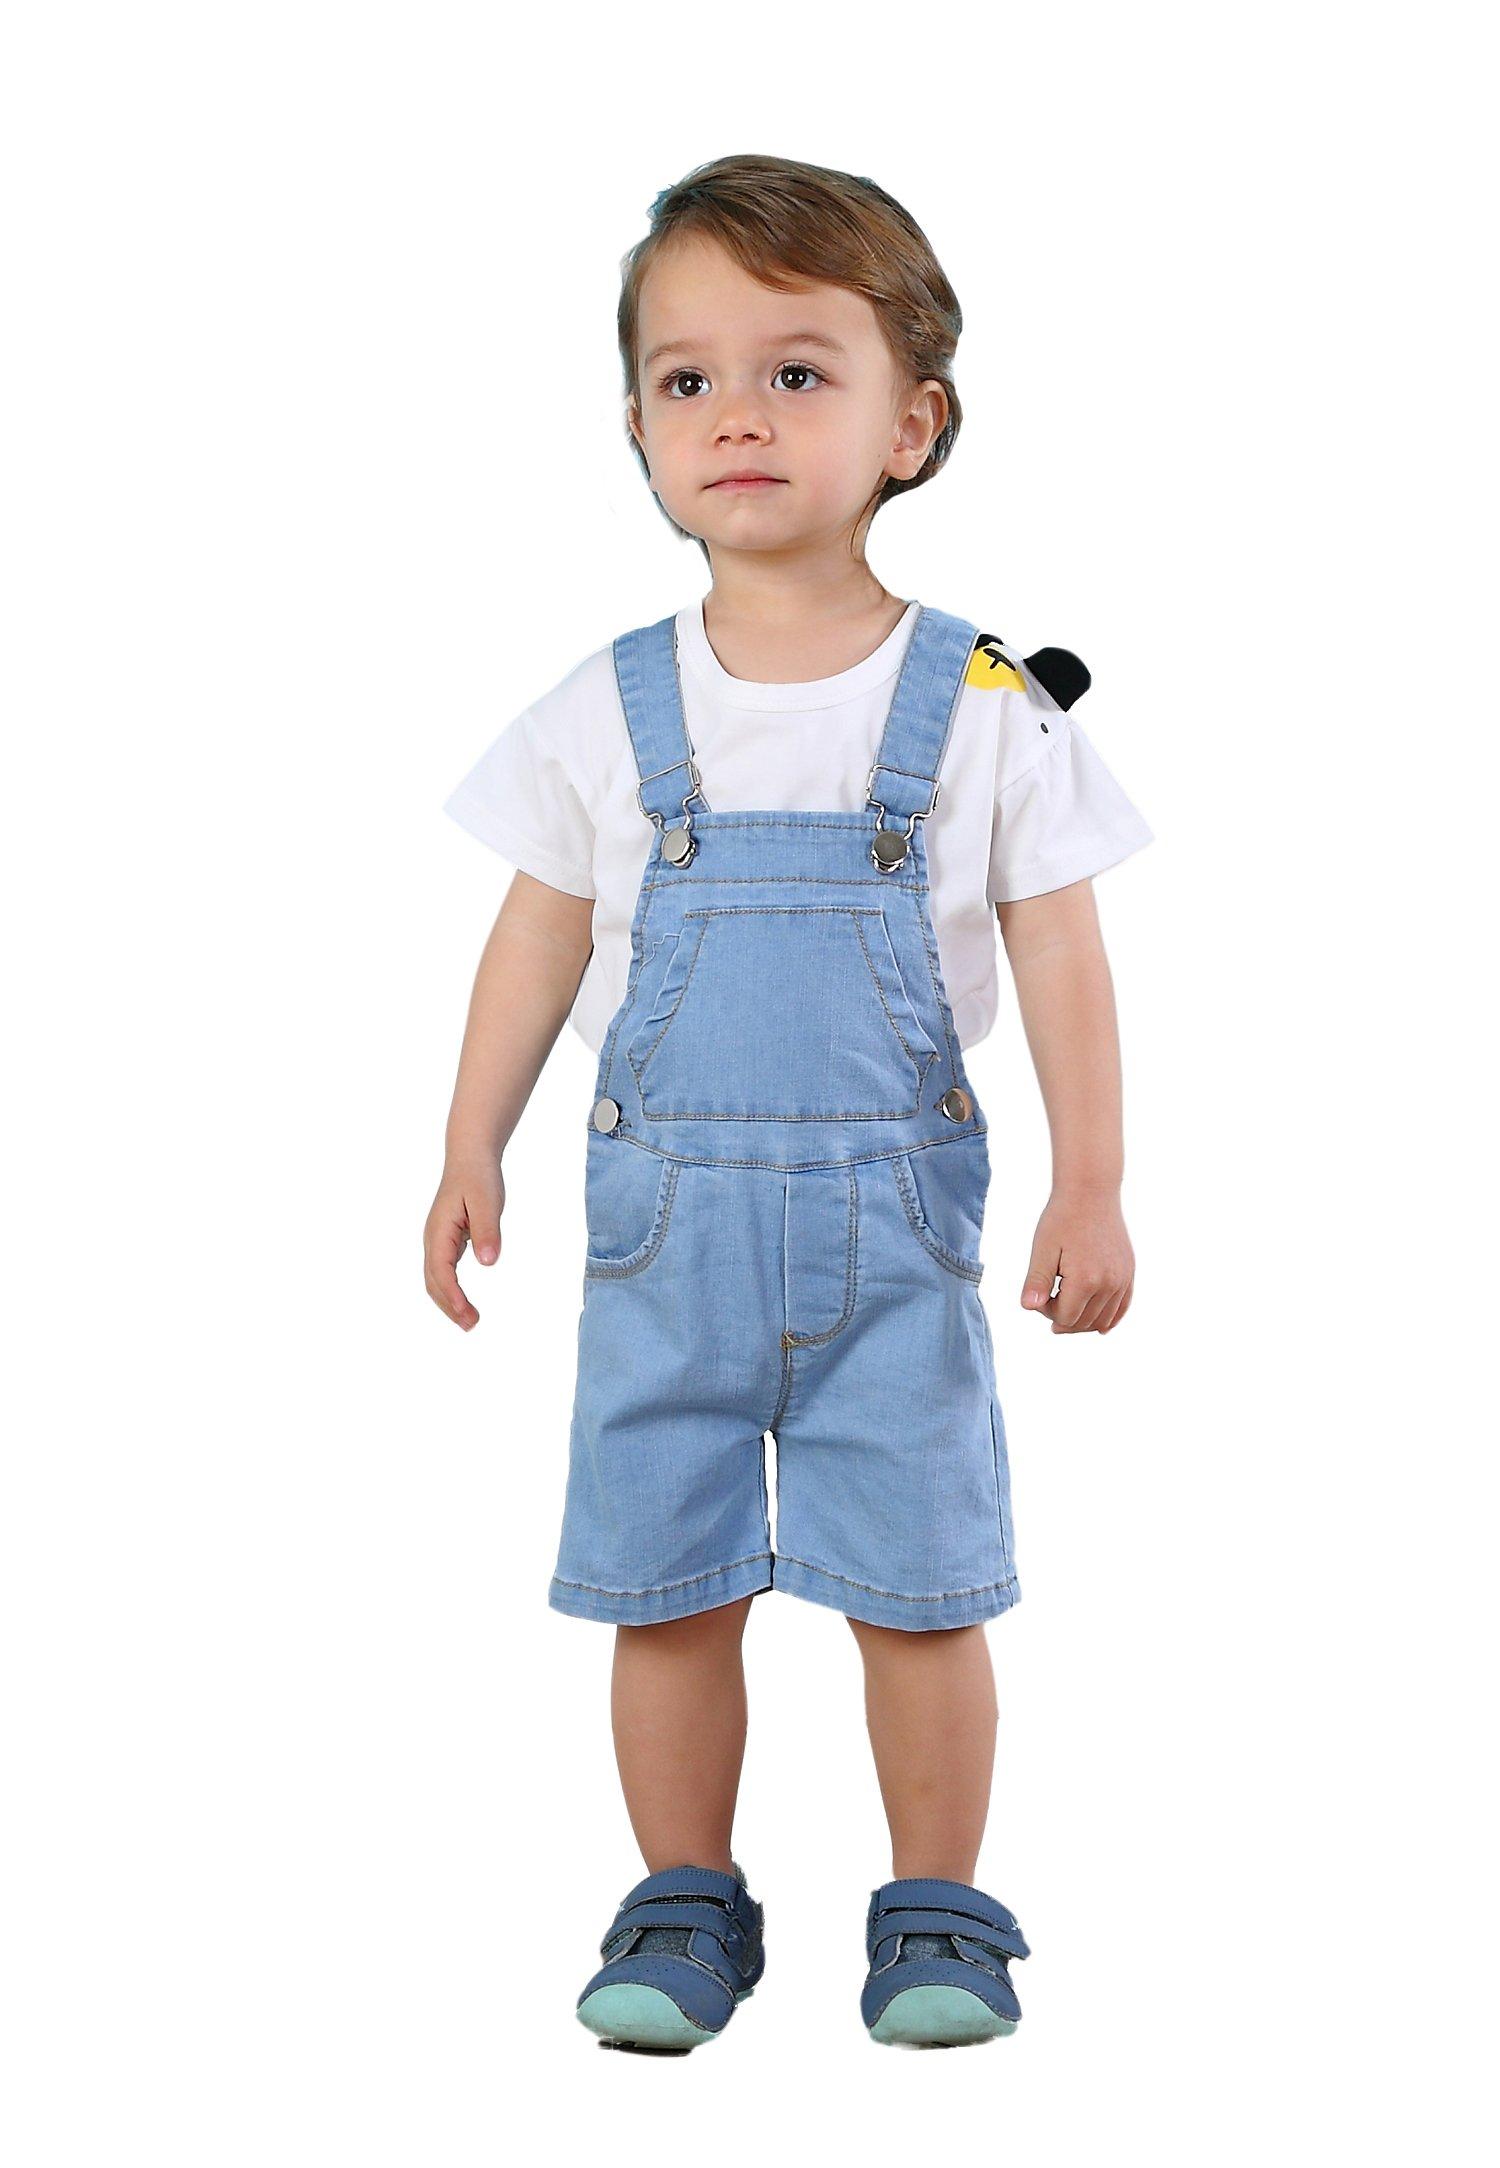 Kidscool Baby & Toddler Girls/Boys Bibs Light Blue Summer Jeans Shortalls,Light Blue,3-4 Years